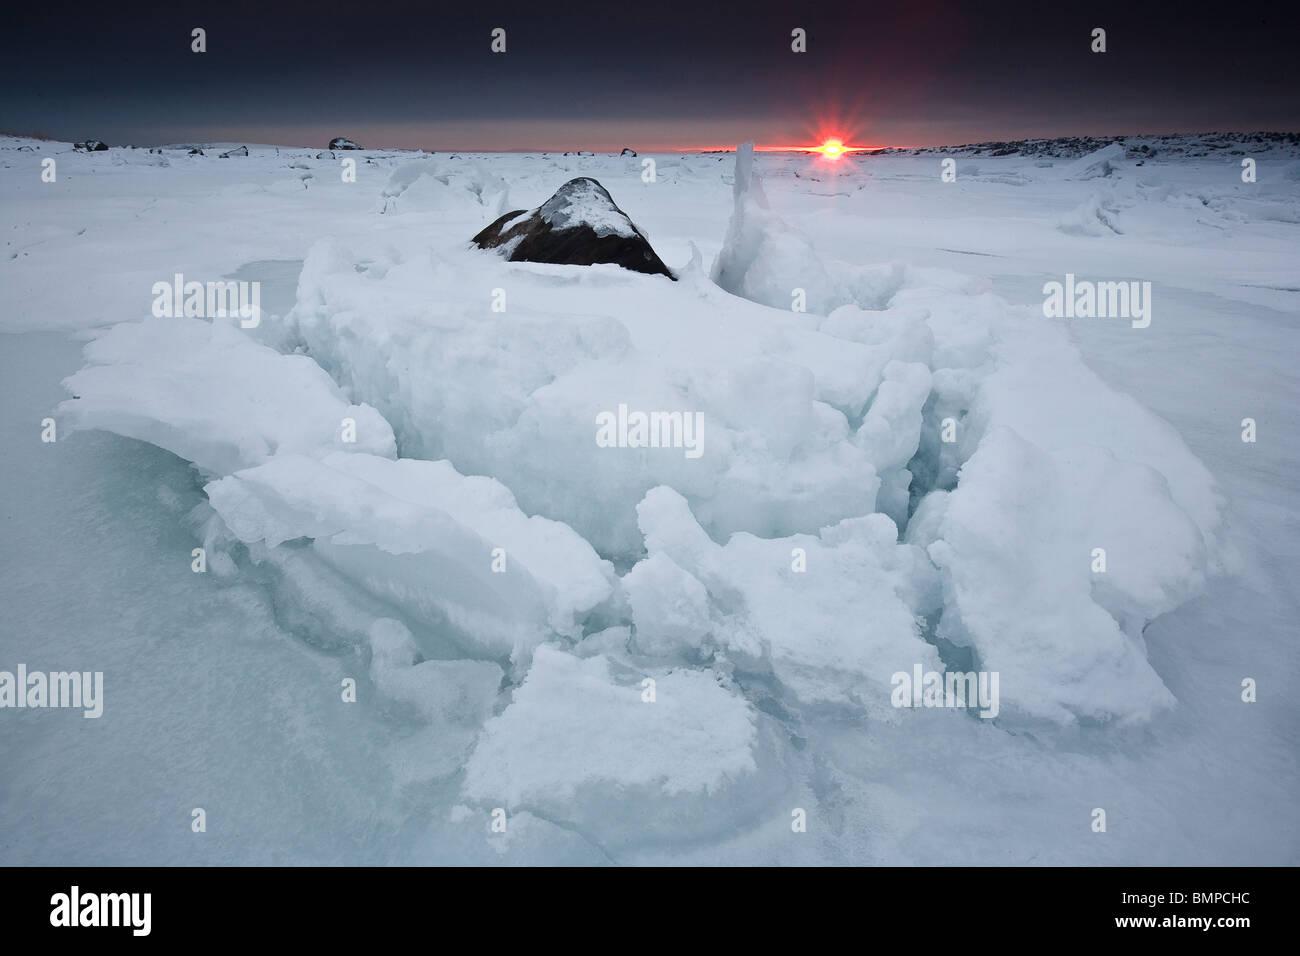 Ice formations and sundown at Larkollen in Rygge kommune, Østfold fylke, Norway. - Stock Image